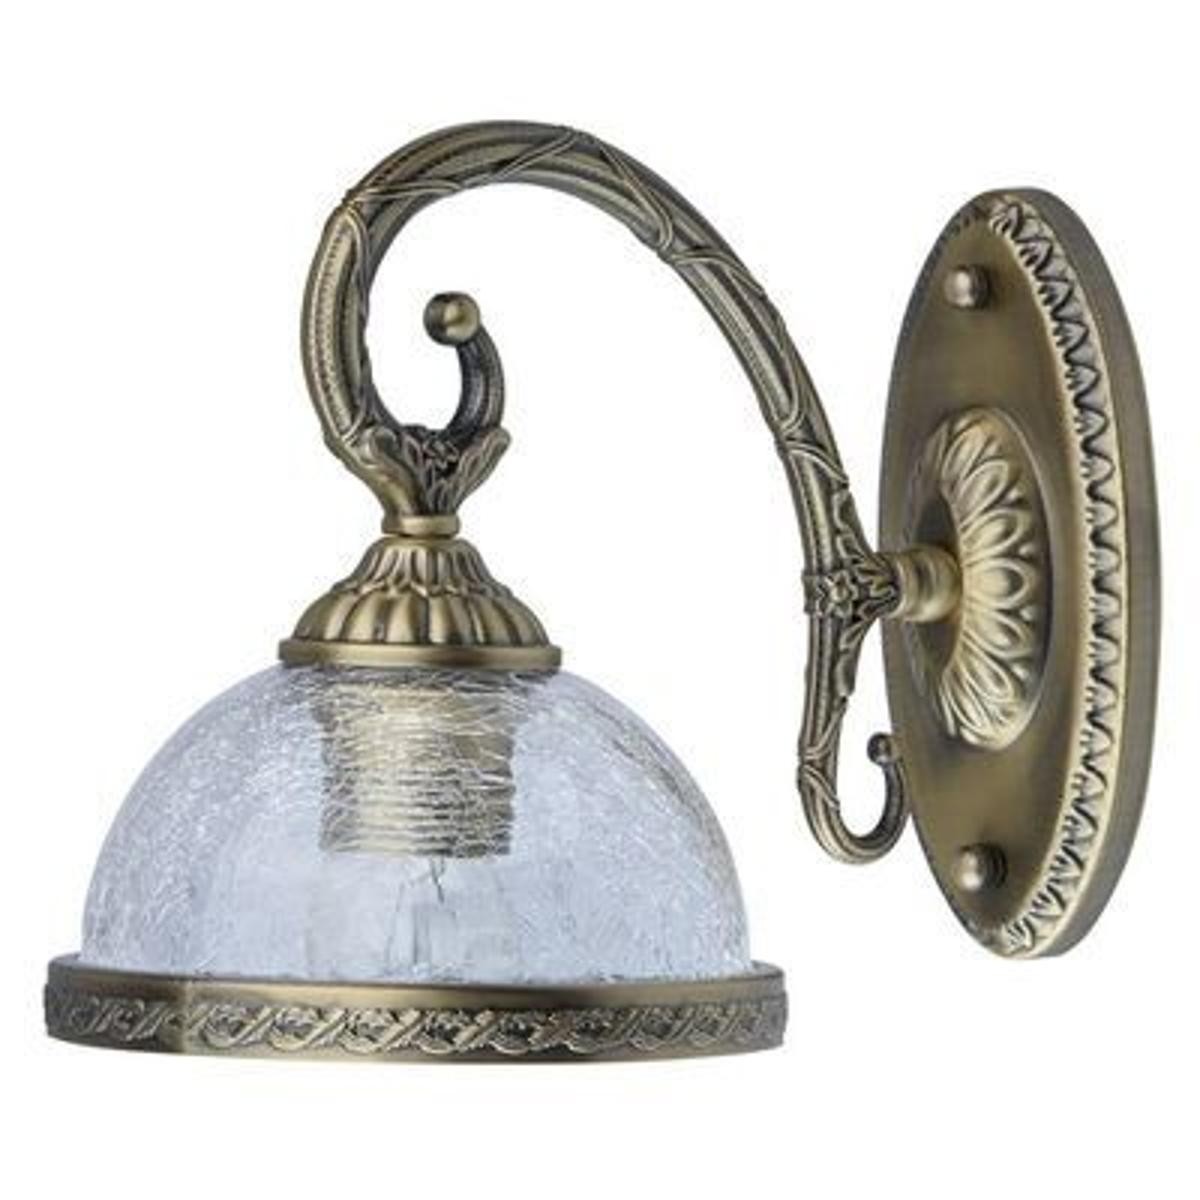 Applique Classic Laiton 1x60W - 481021901 - MW-LIGHT - 481021901